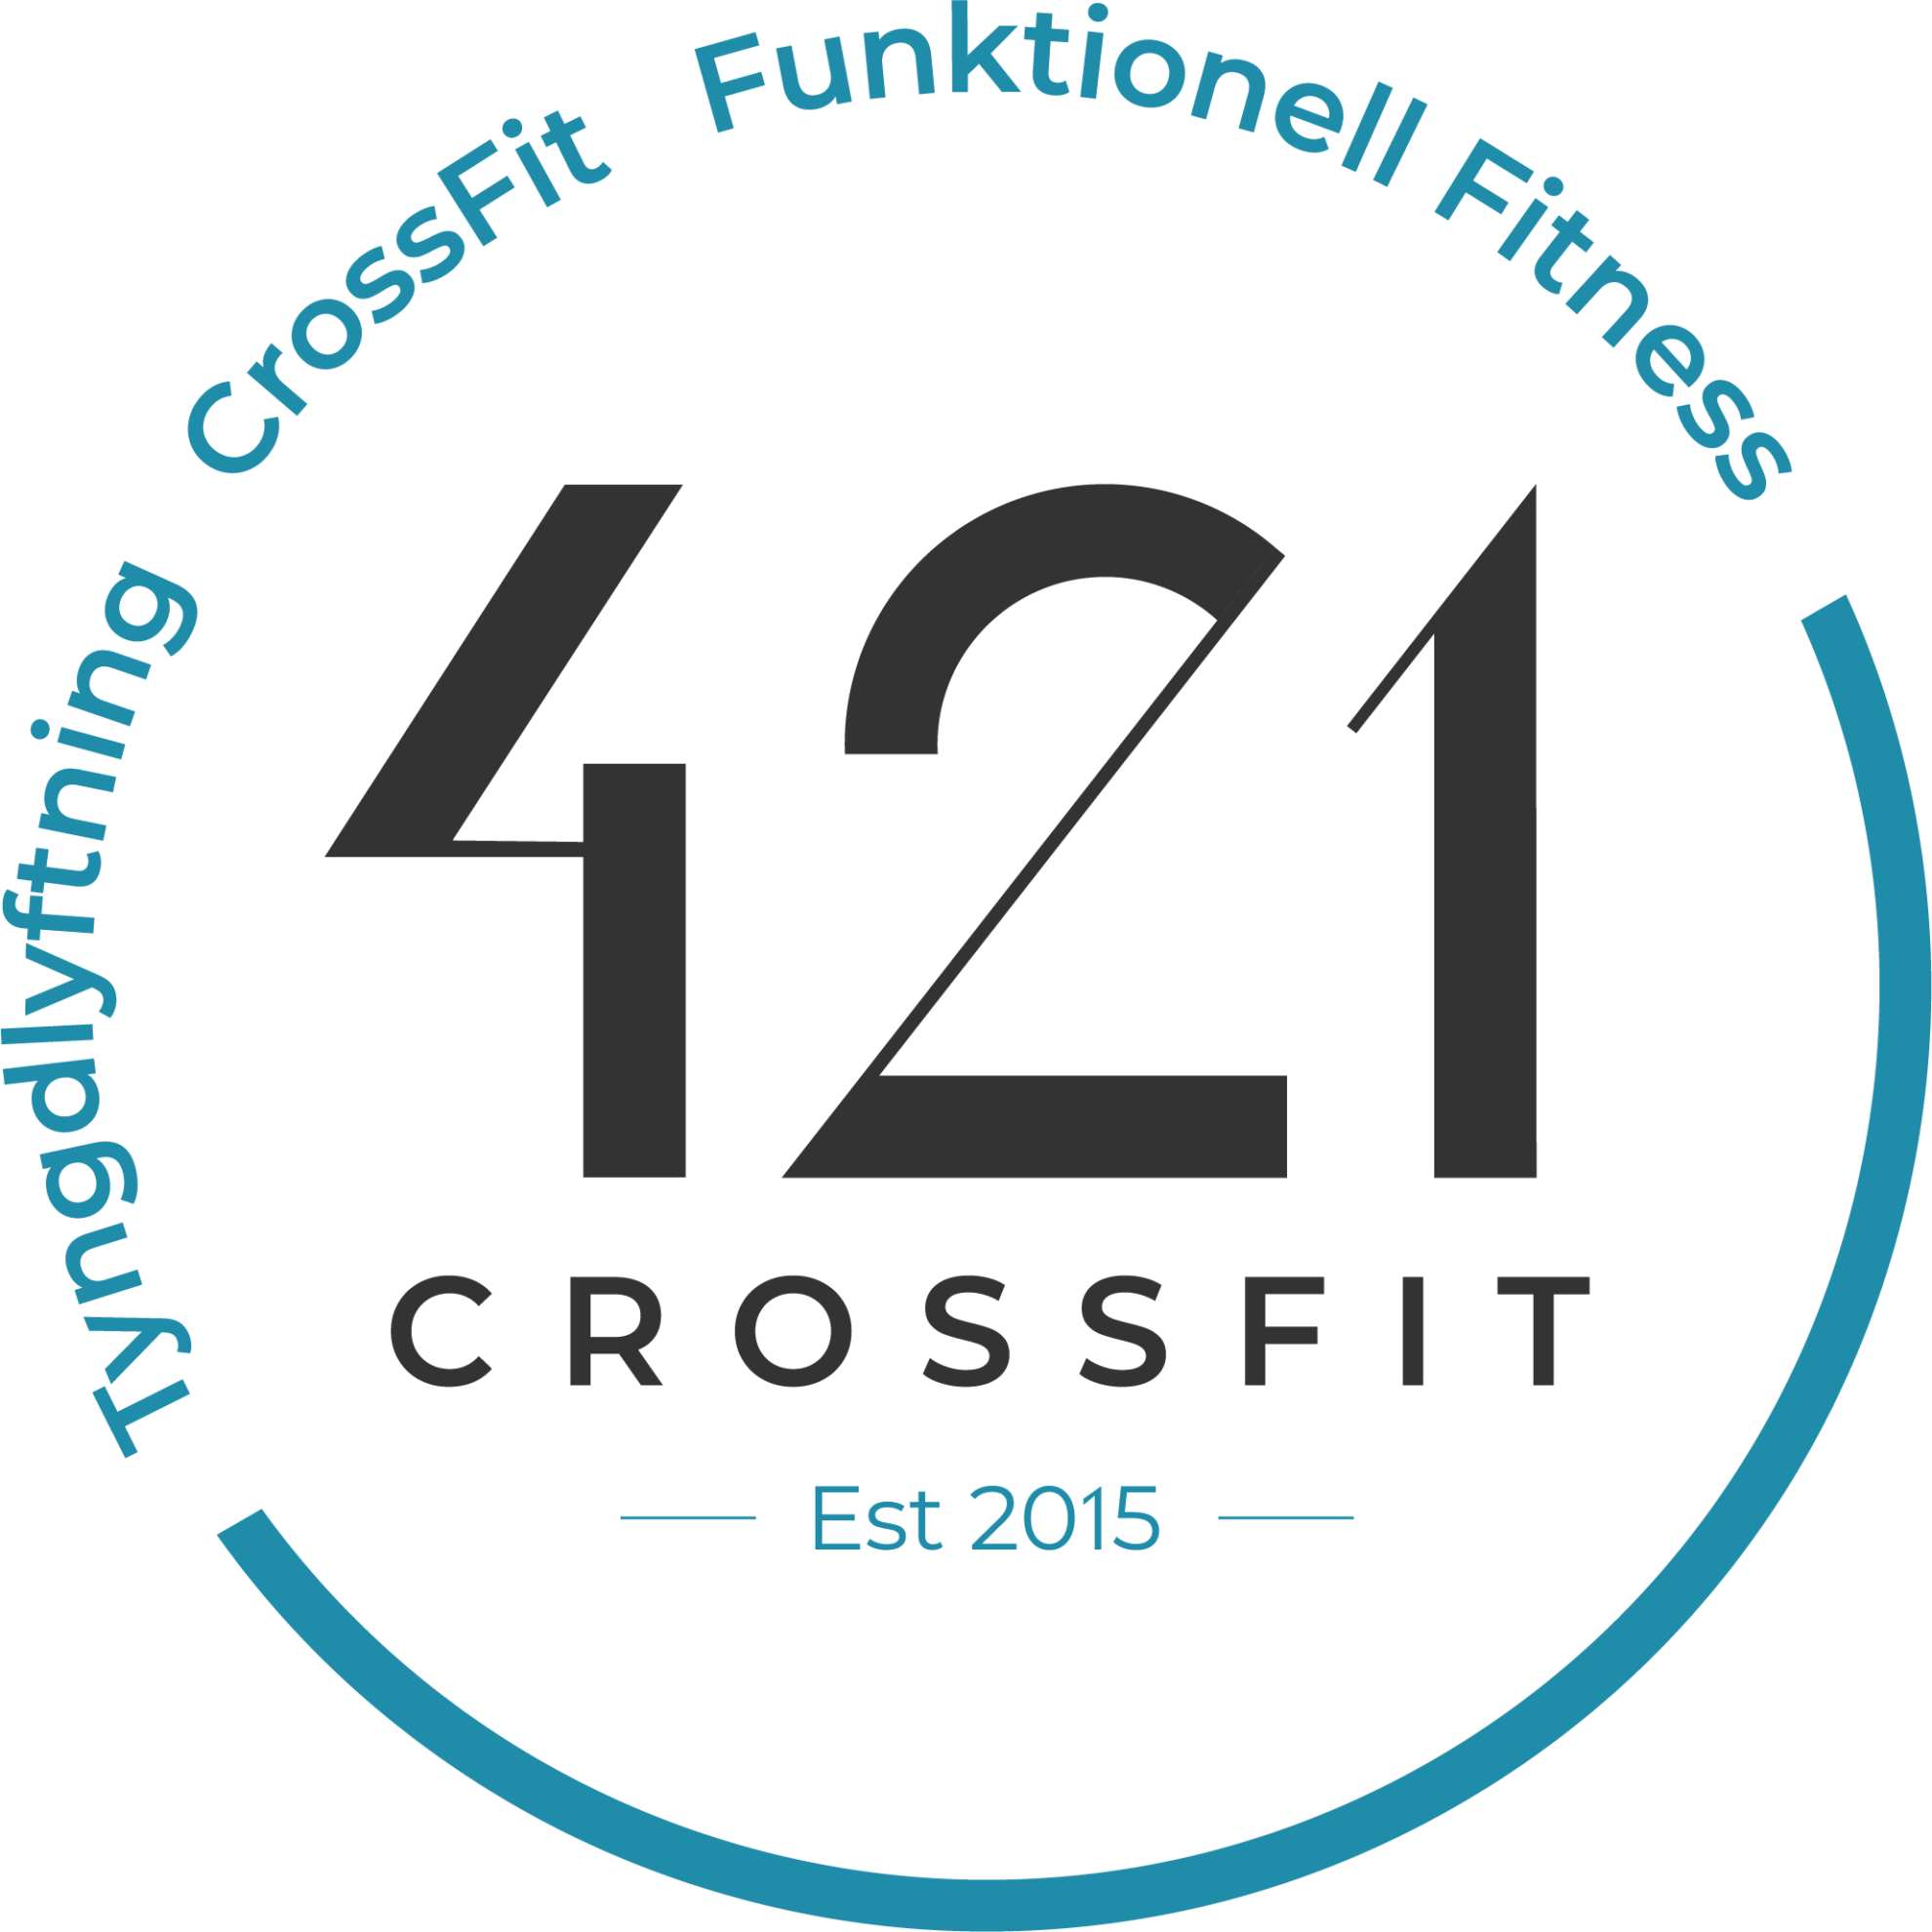 421 CrossFit Göteborg